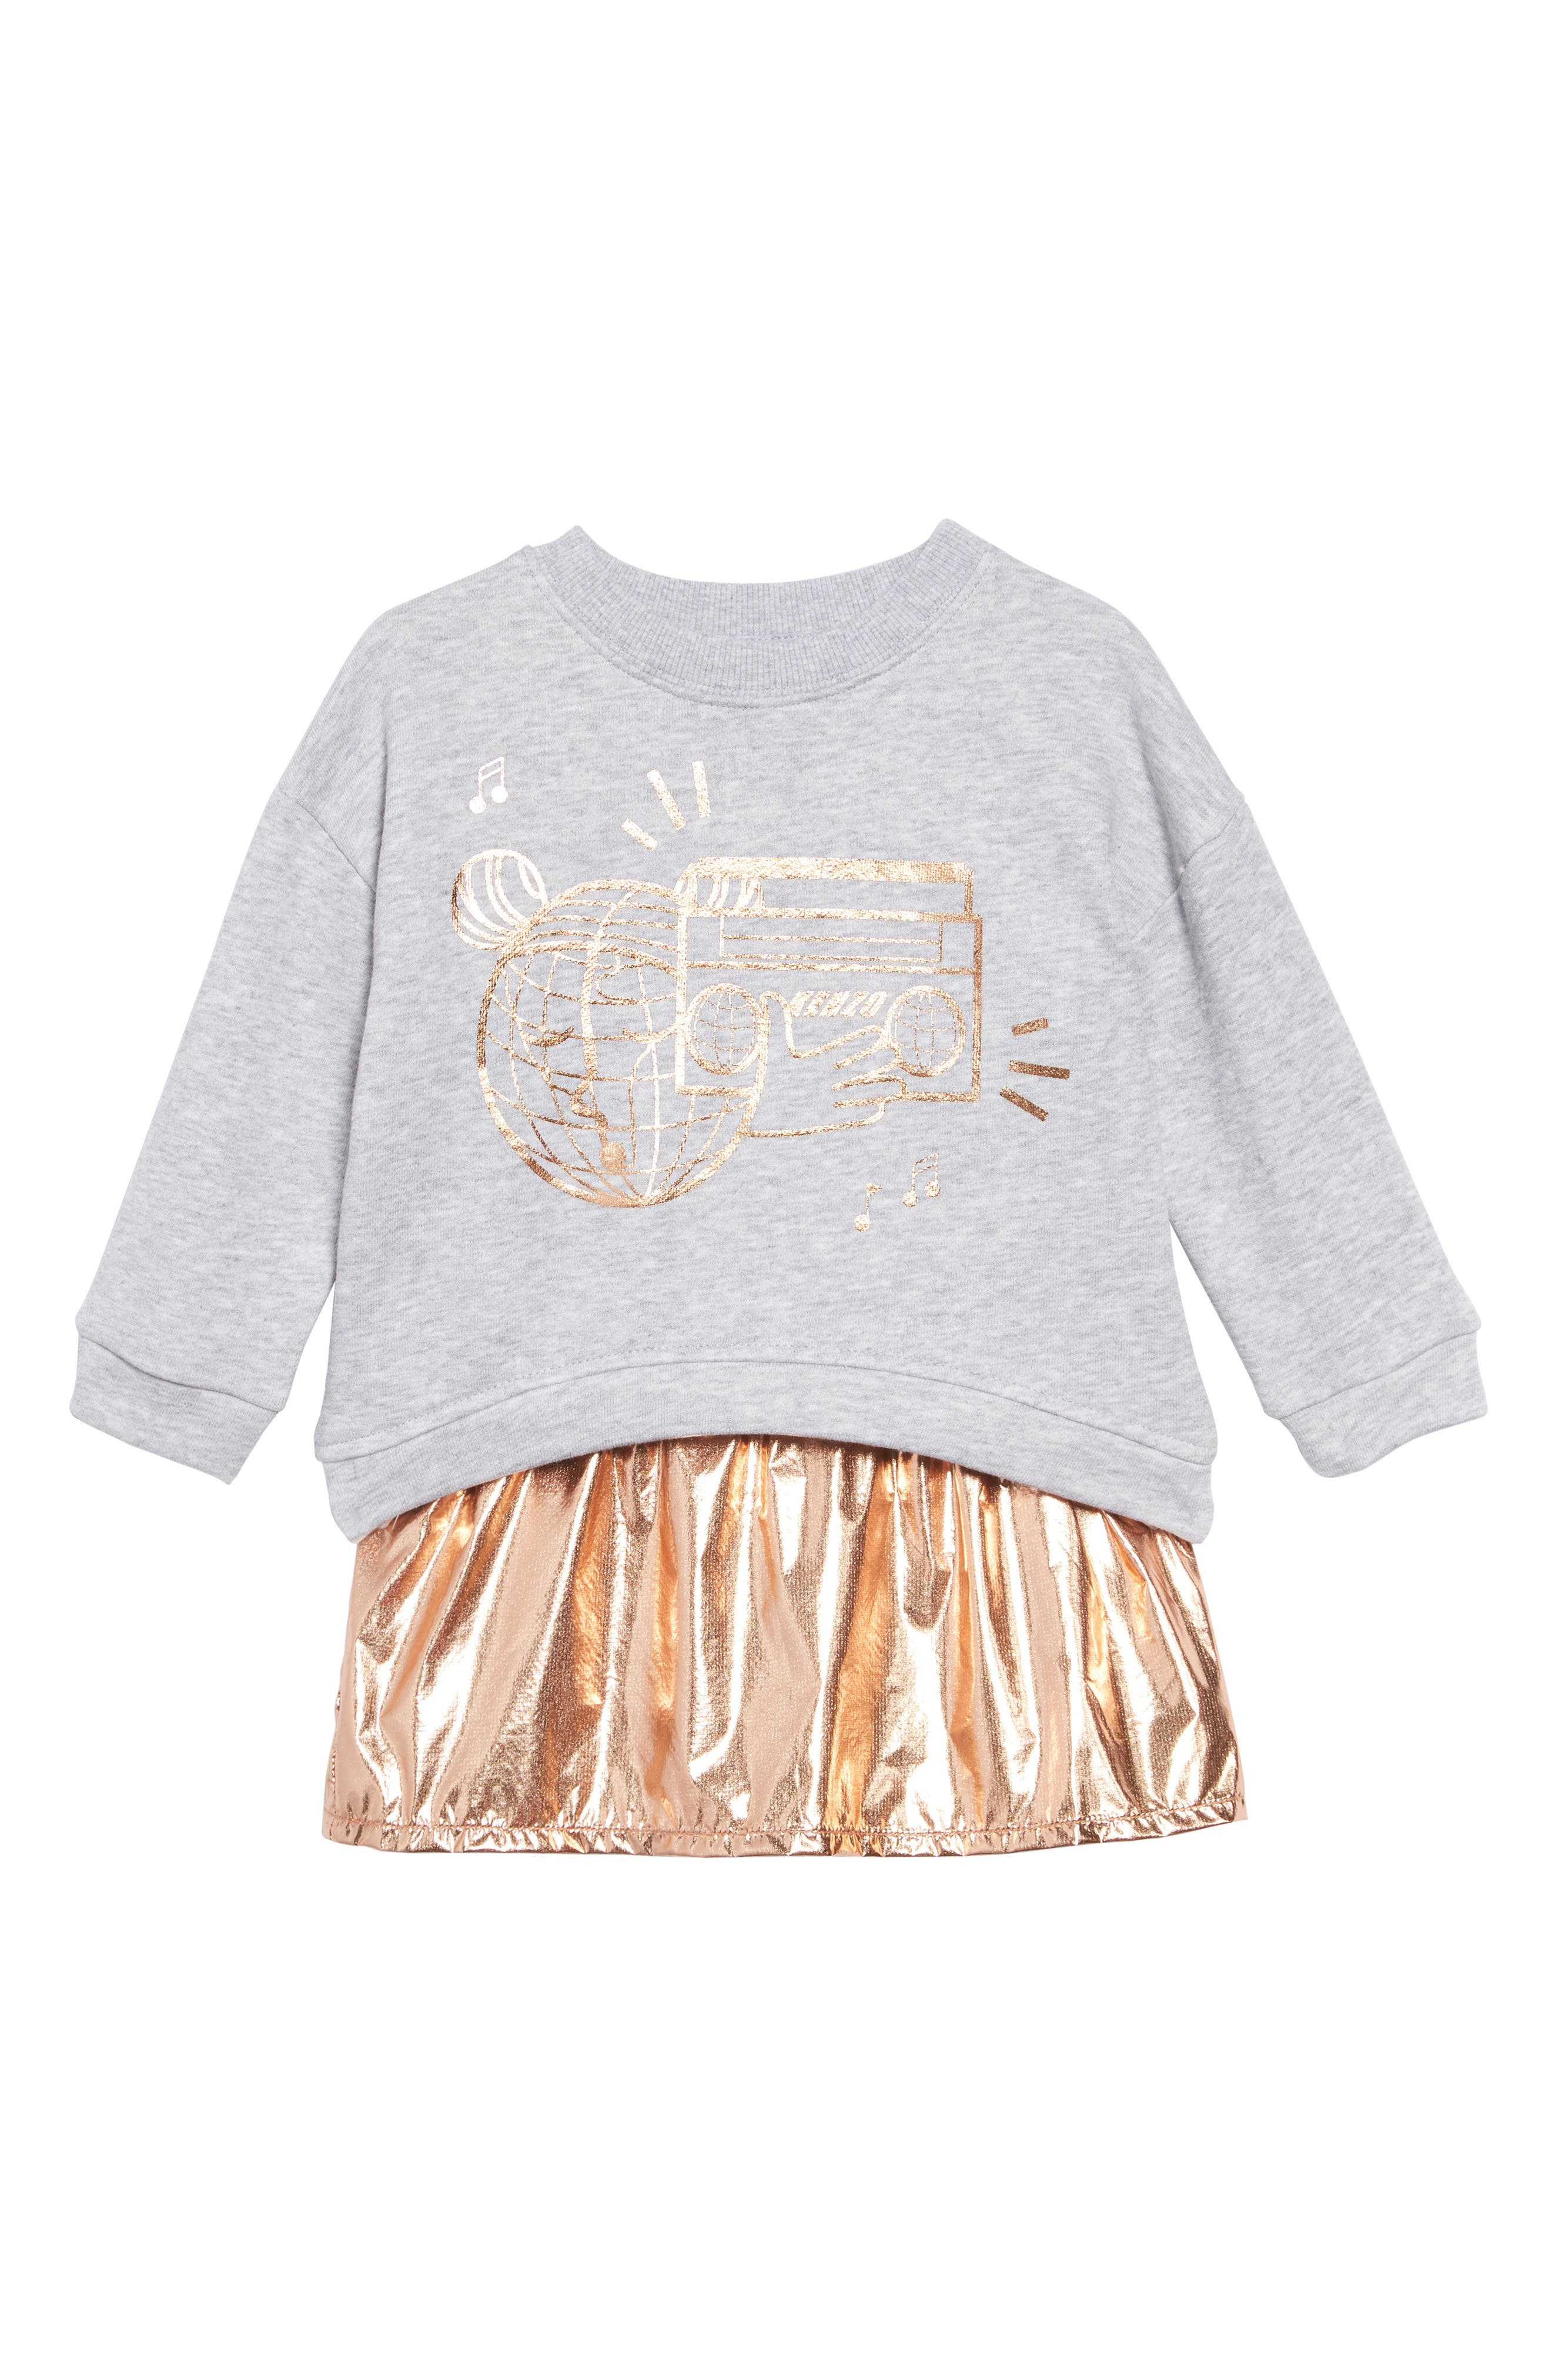 Metallic Graphic Sweatshirt & Dress Set,                             Main thumbnail 1, color,                             COPPER